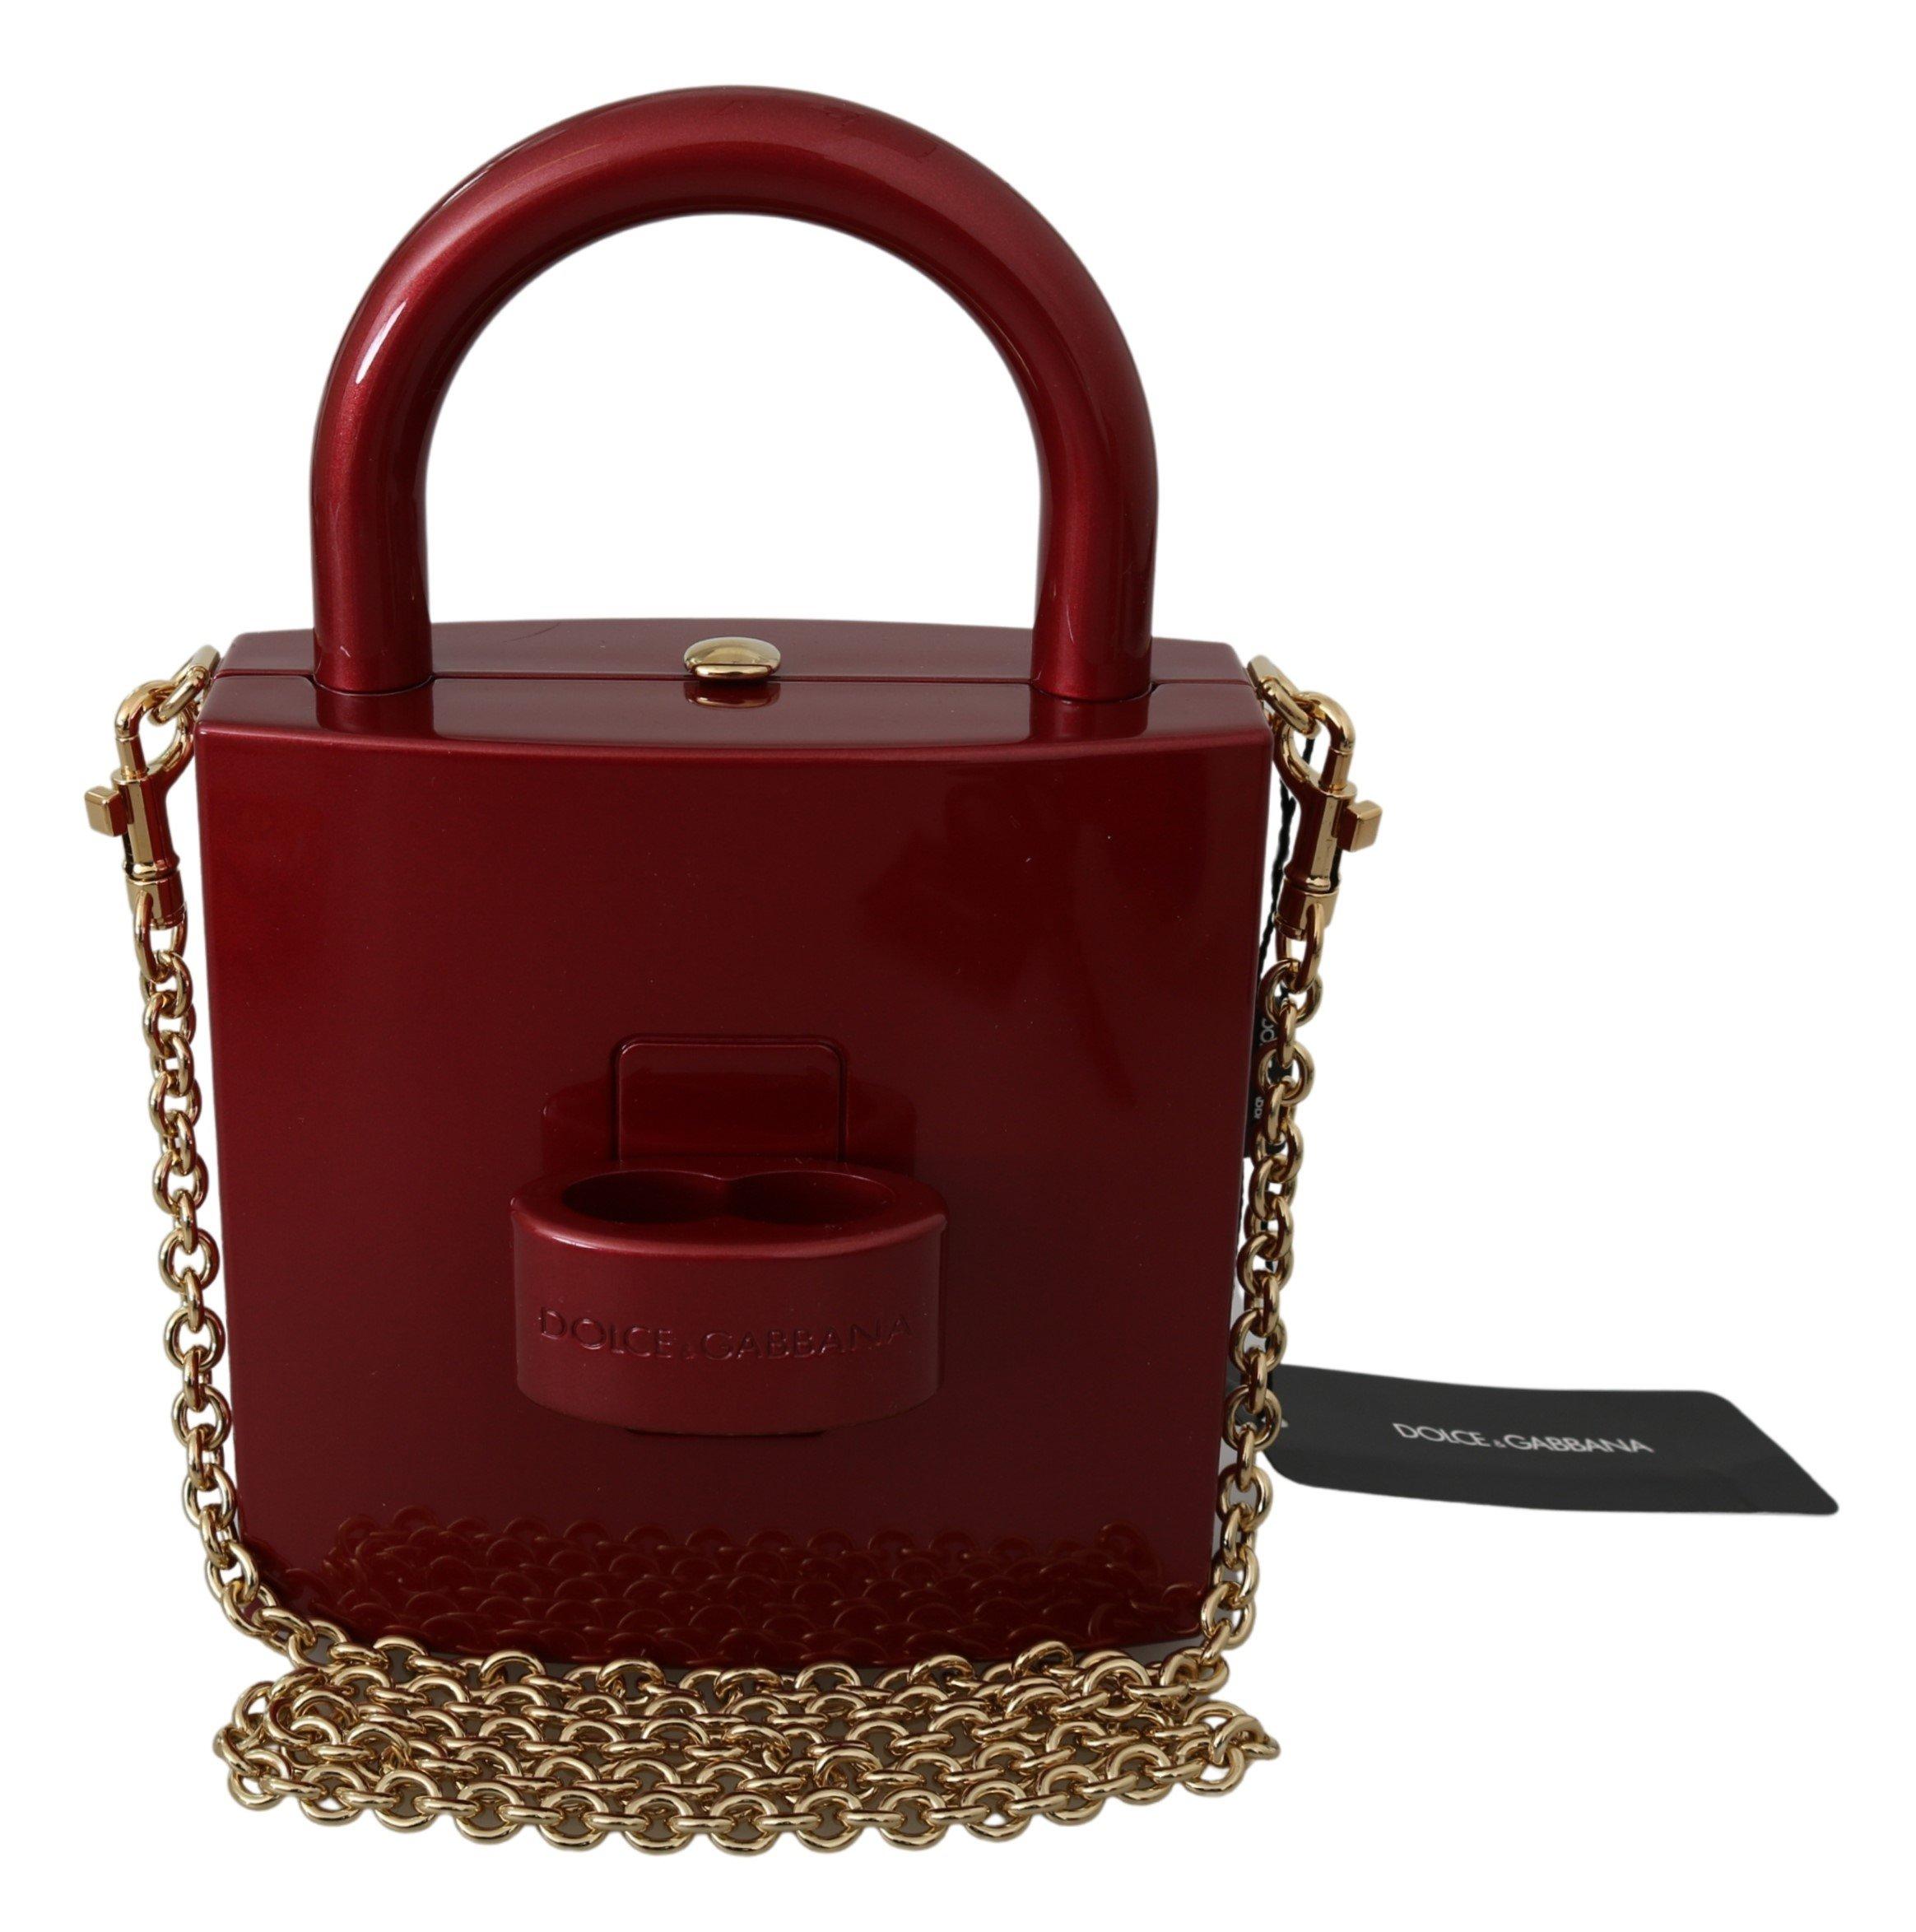 Dolce & Gabbana Women's Padlock Chain Shoulder Bag Red VAS9725